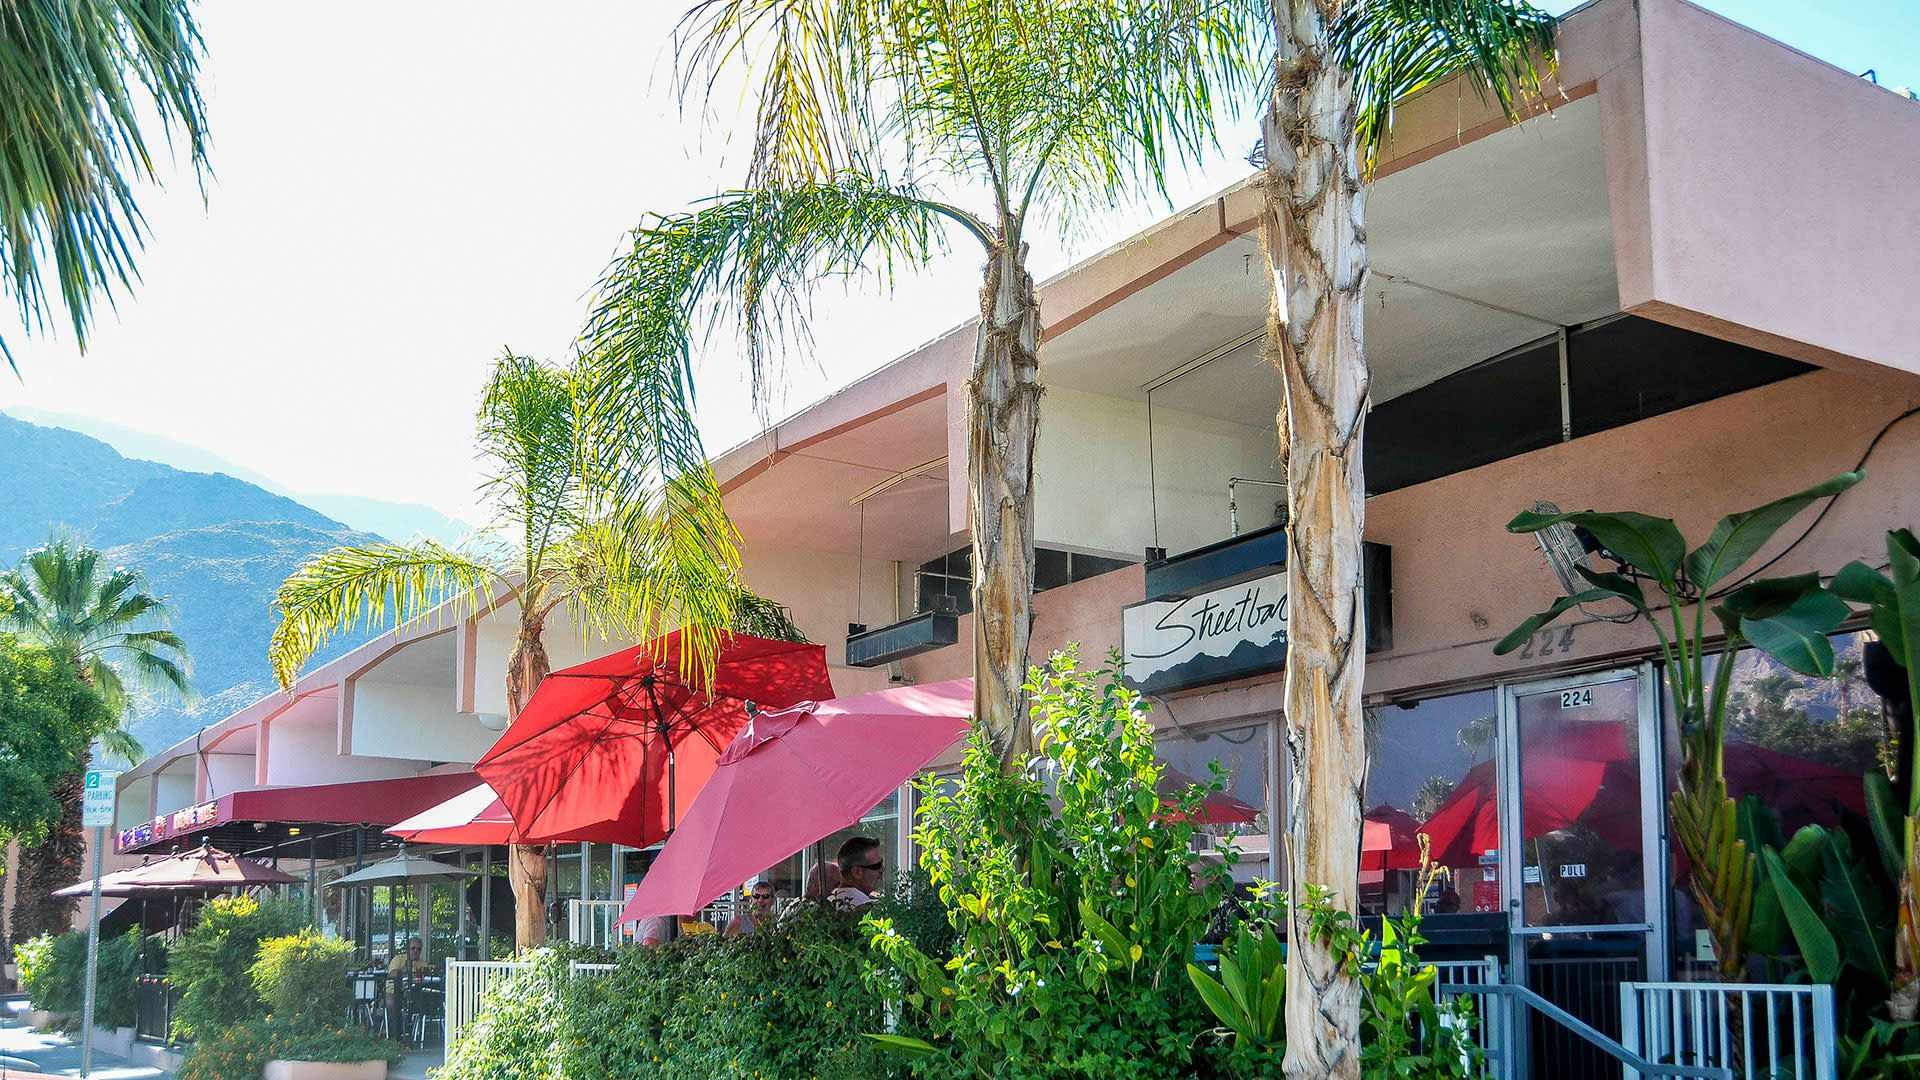 streetbar in palm springs